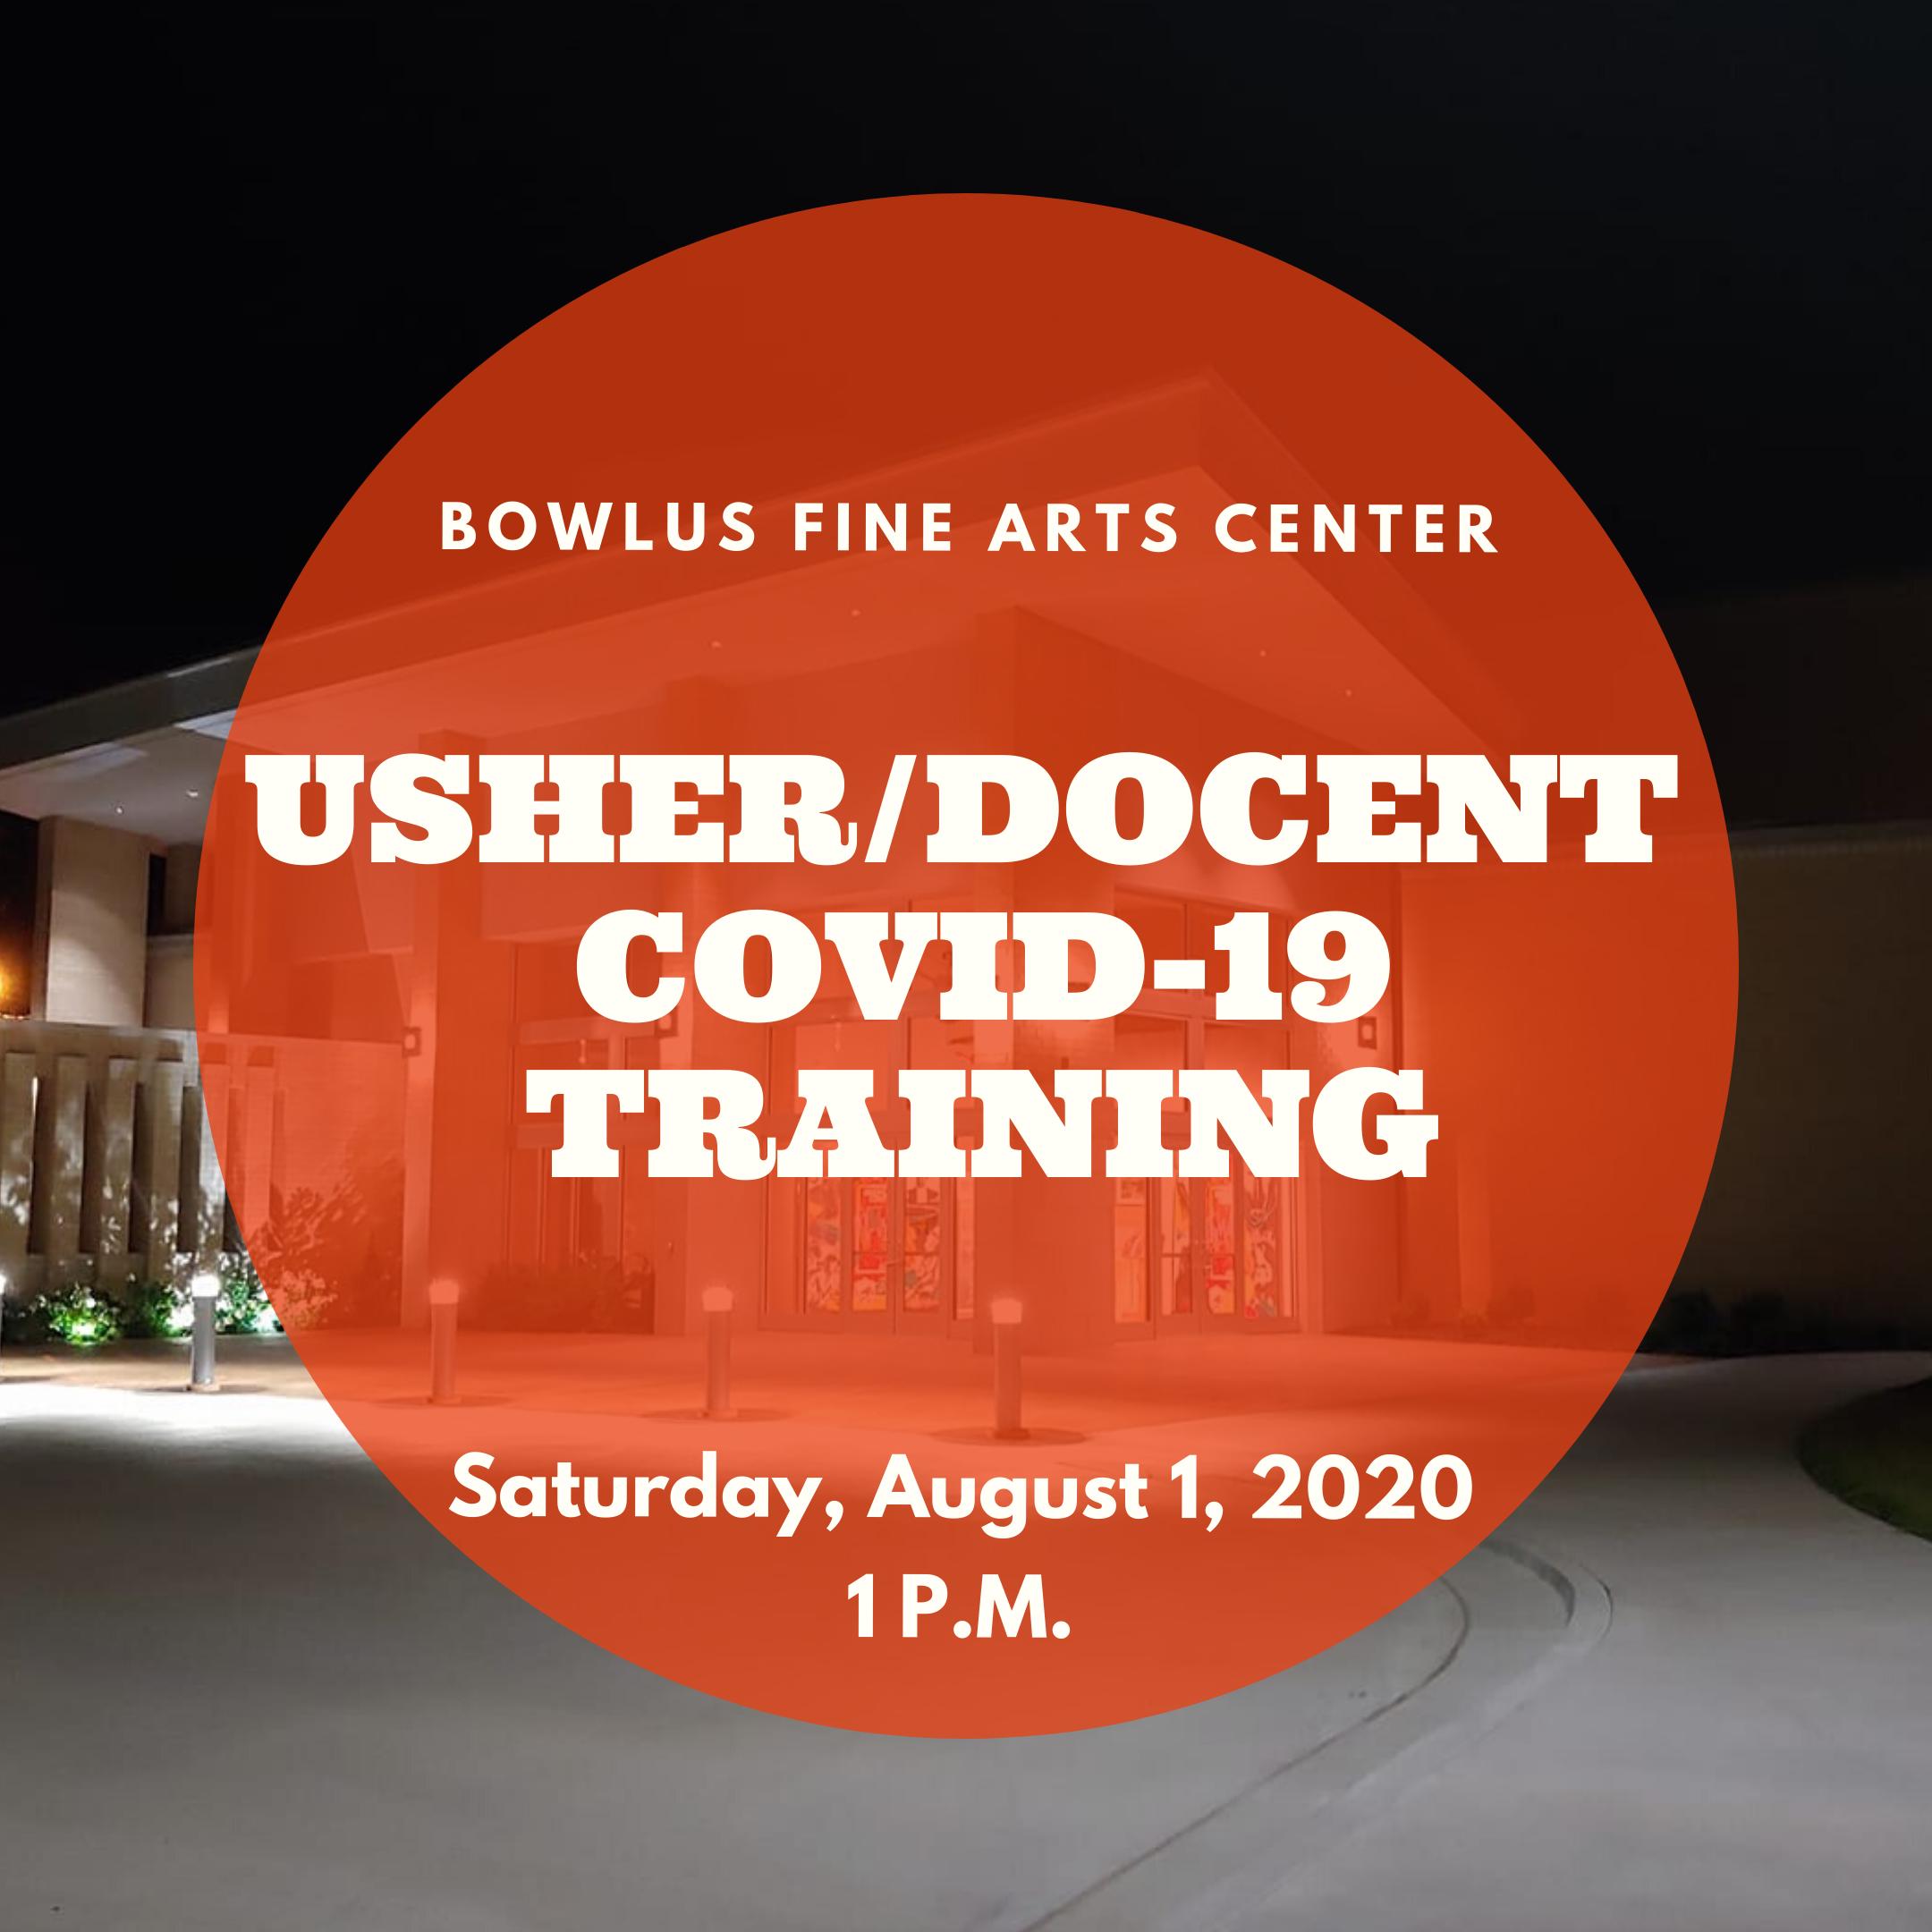 Usher/Docent Covid-19 Training